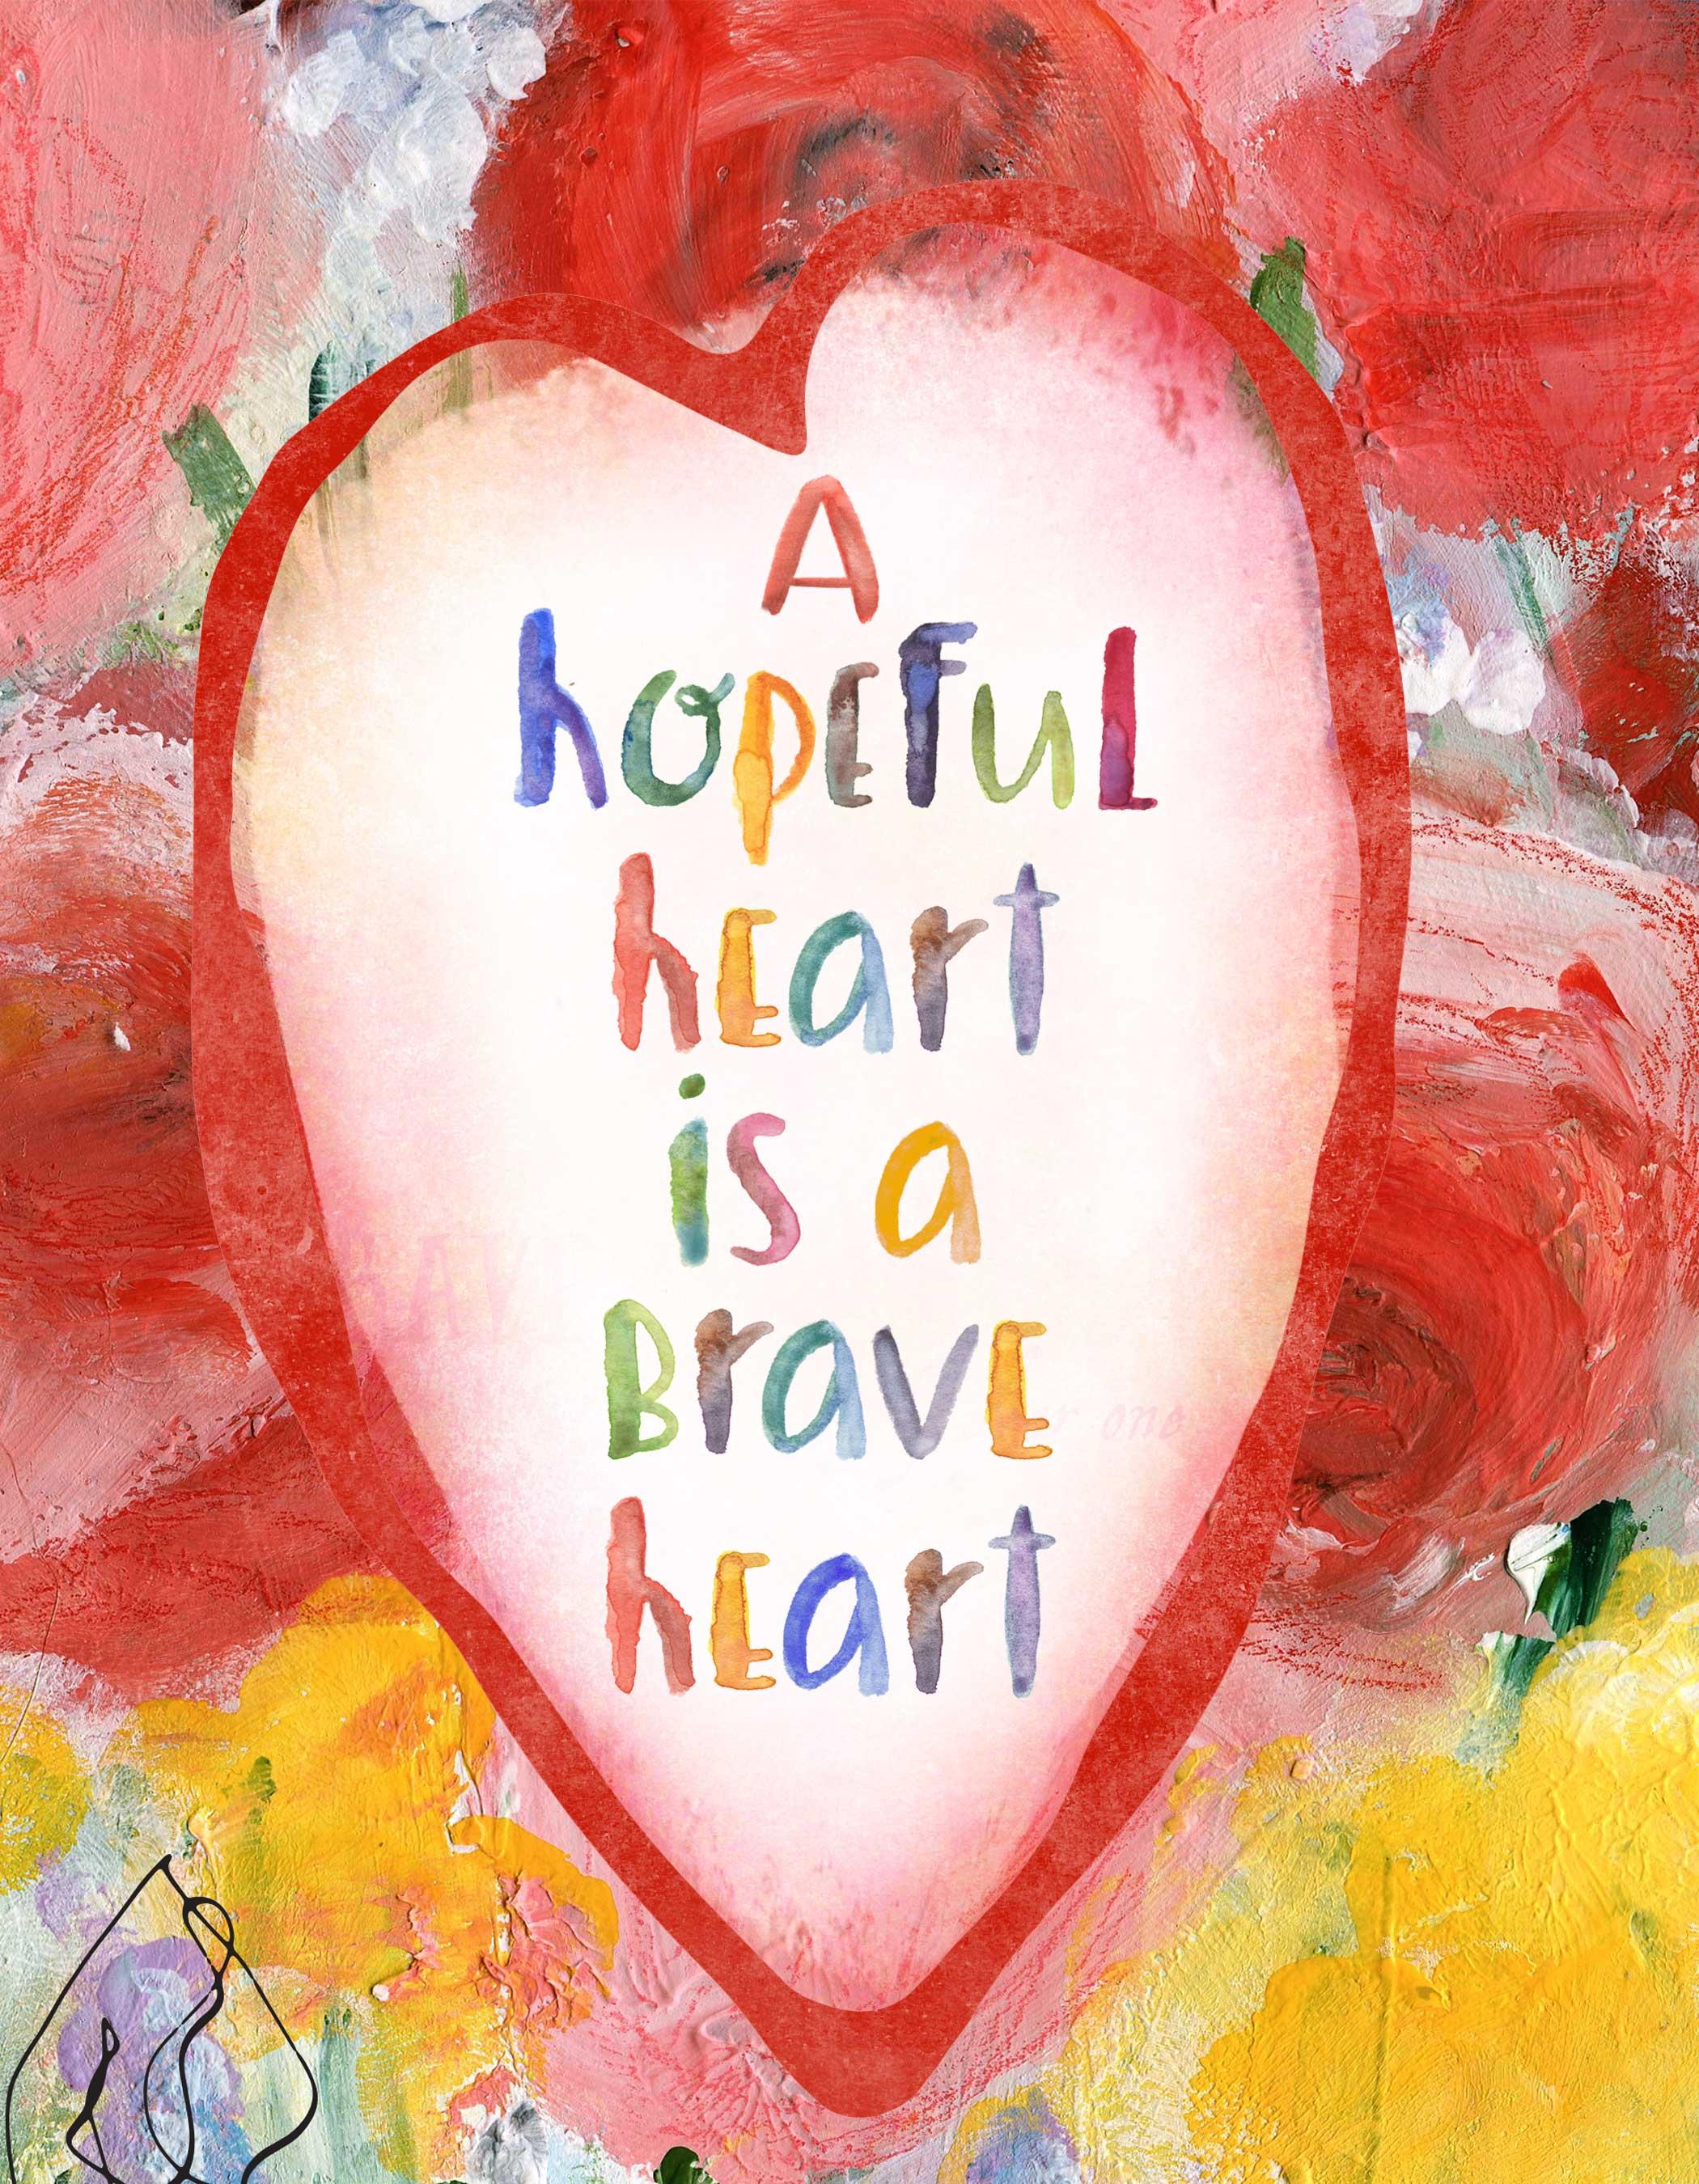 Elizatodd_brave-heart.jpg